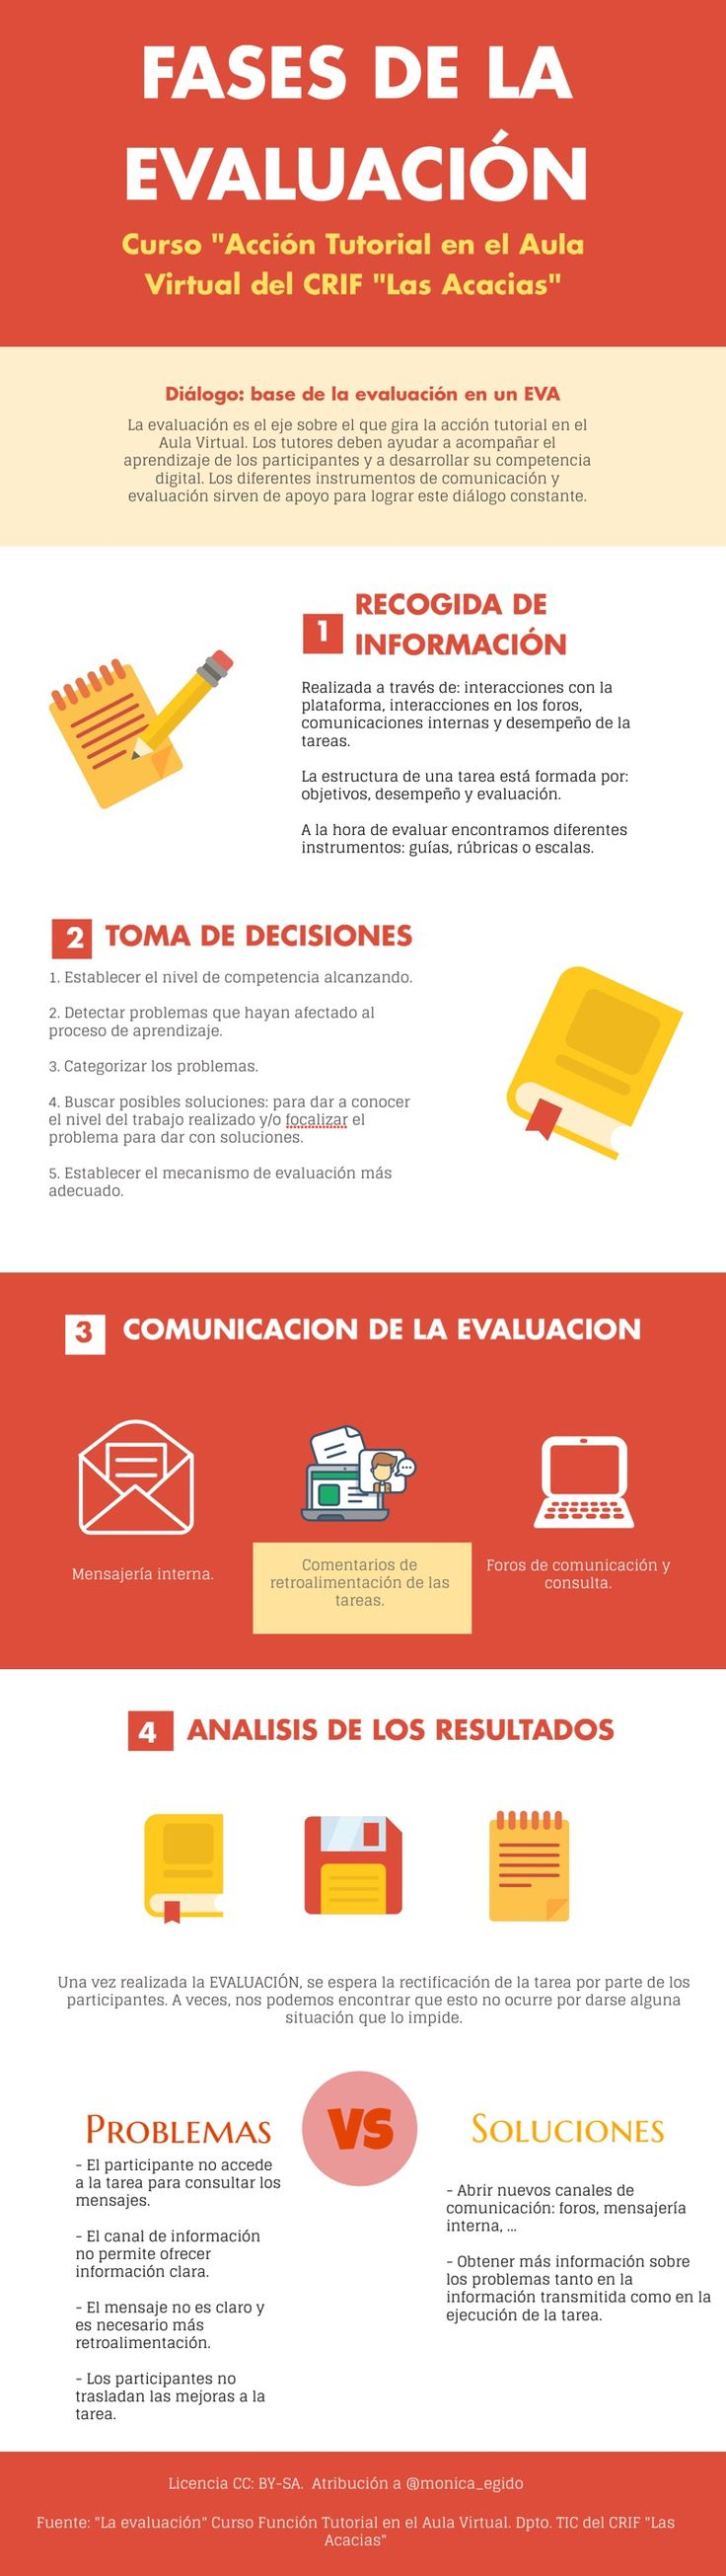 Infografia sobre la Evaluación en e-learning